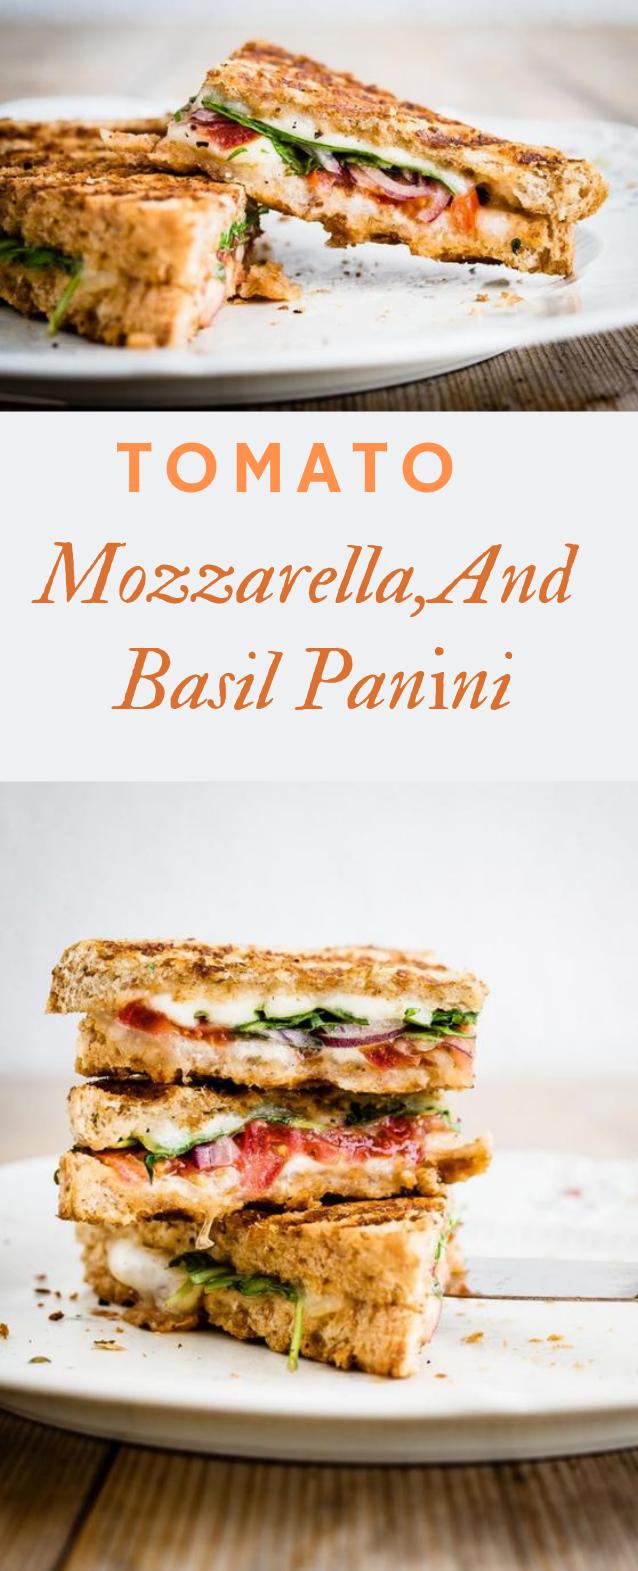 Tomato, Mozzarella, and Basil Panini #vegetarian #food